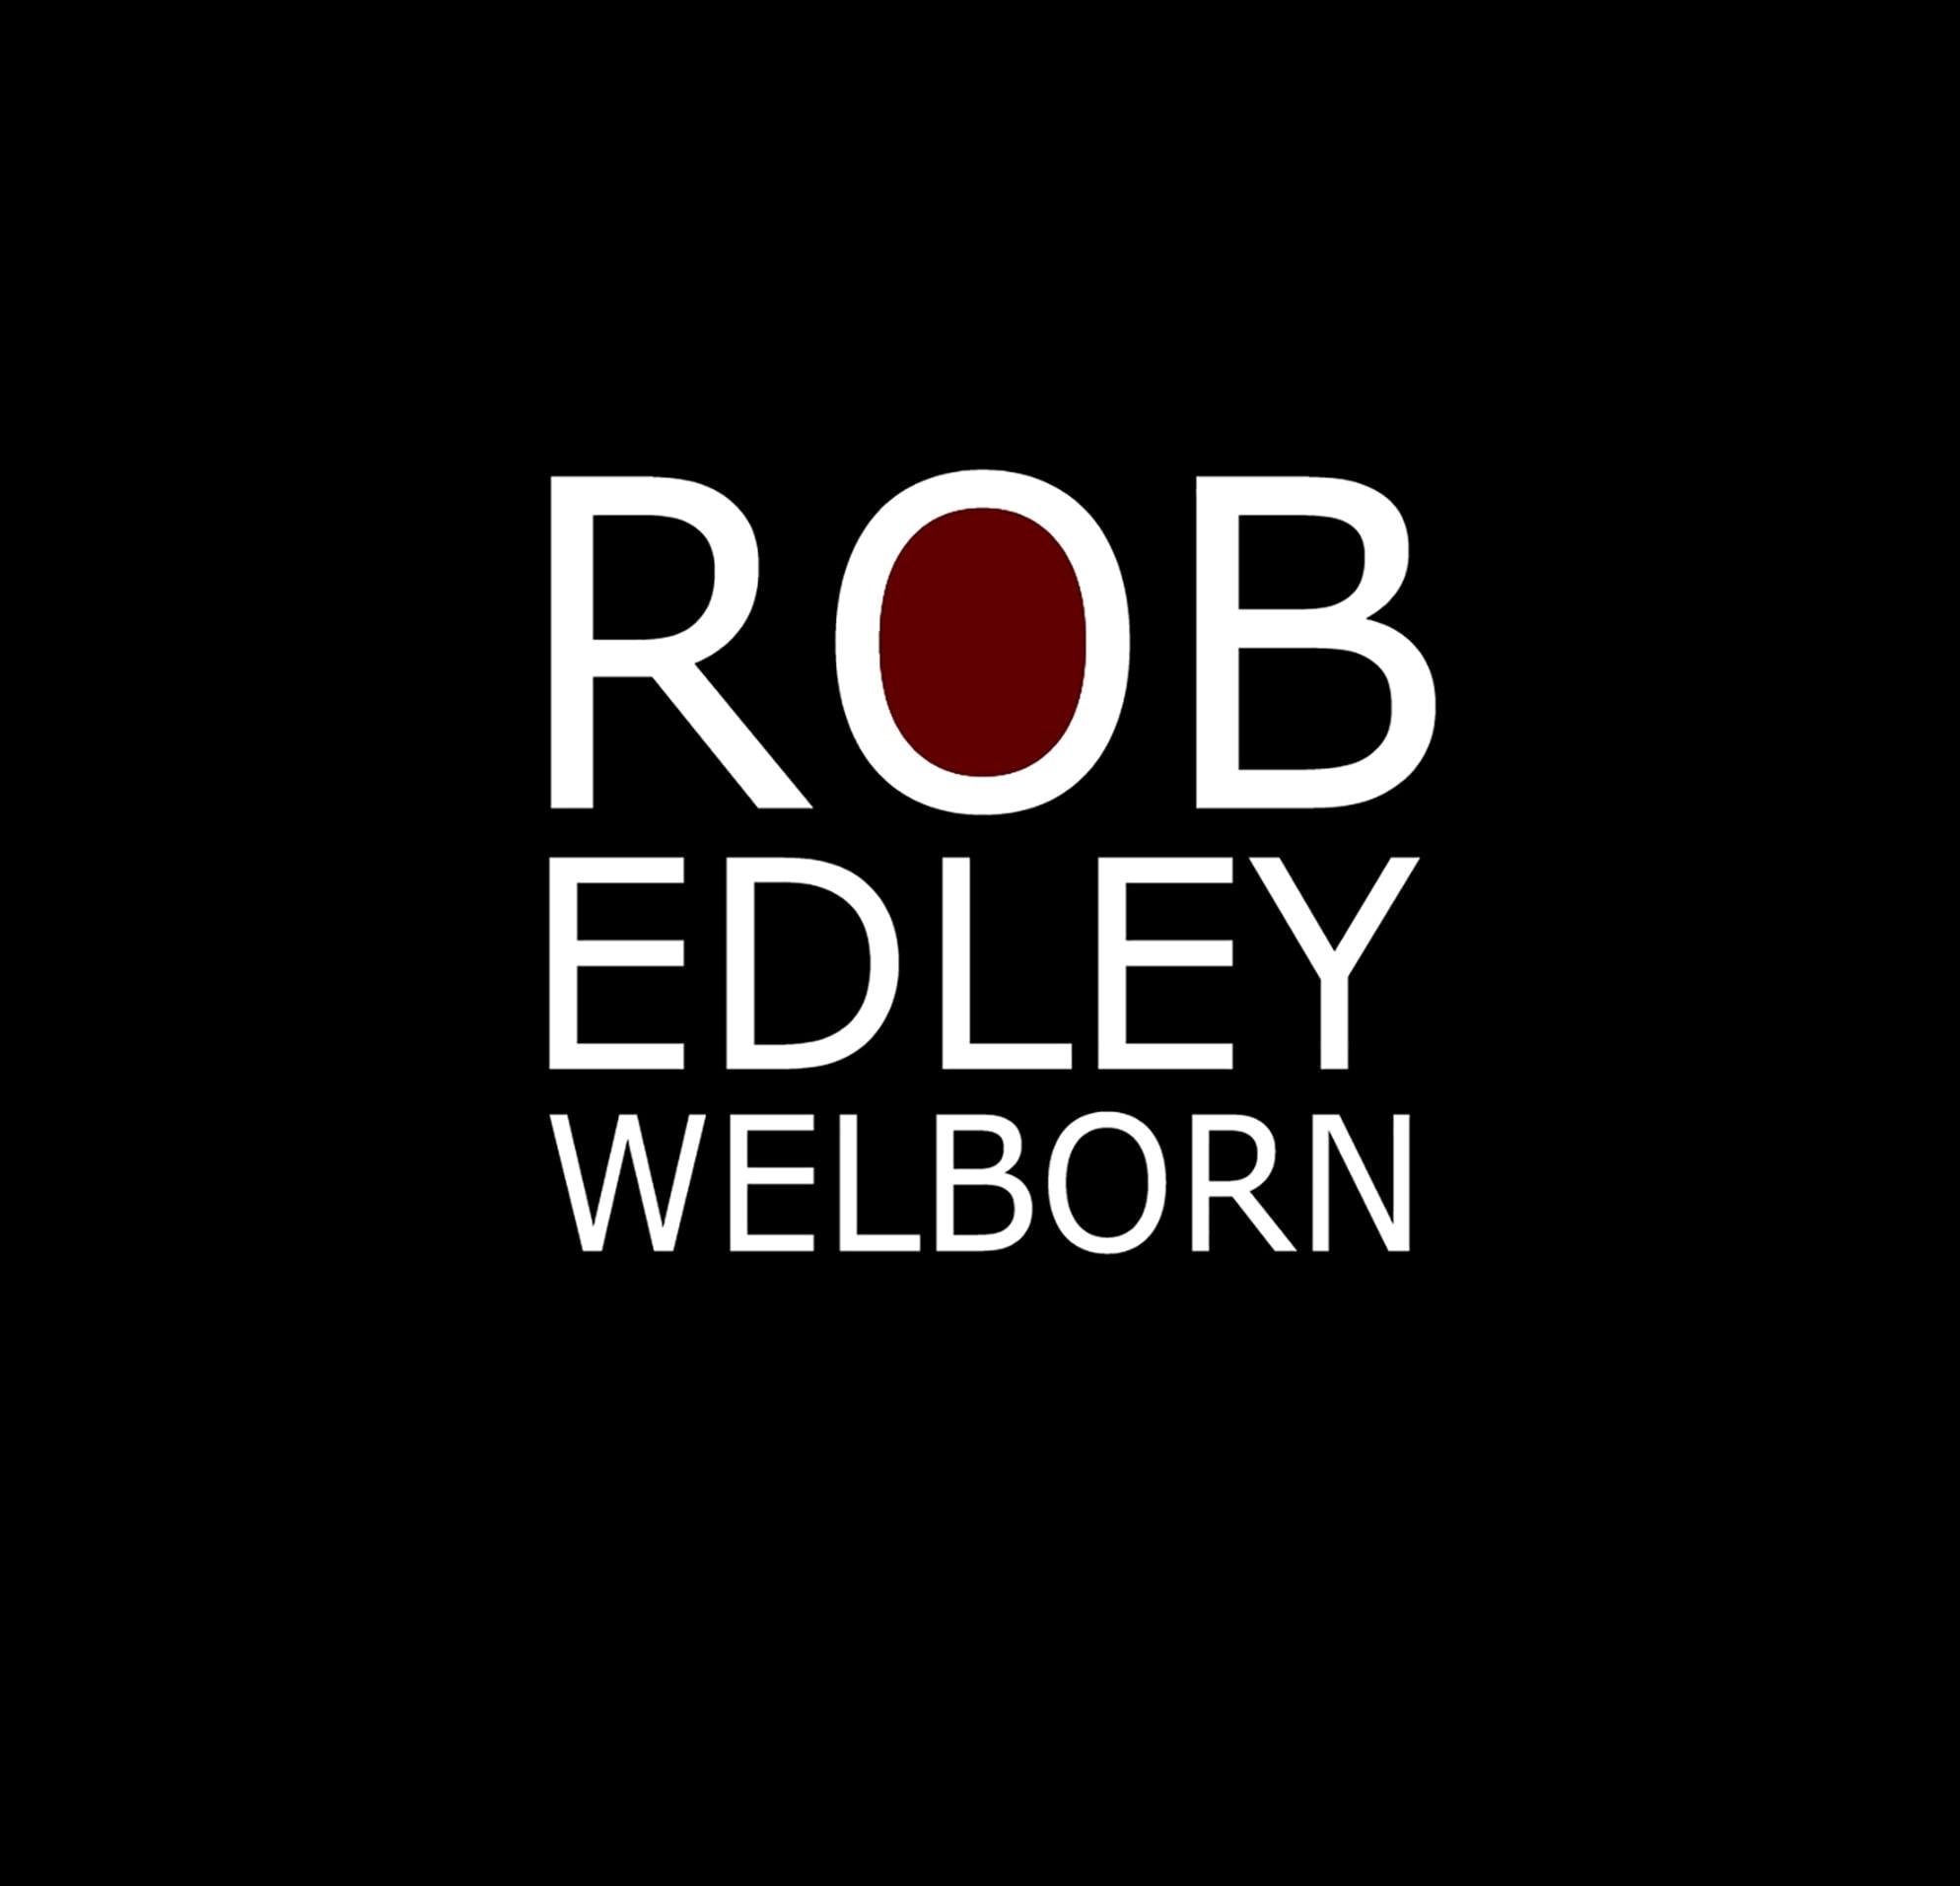 Rob Edley Welborn